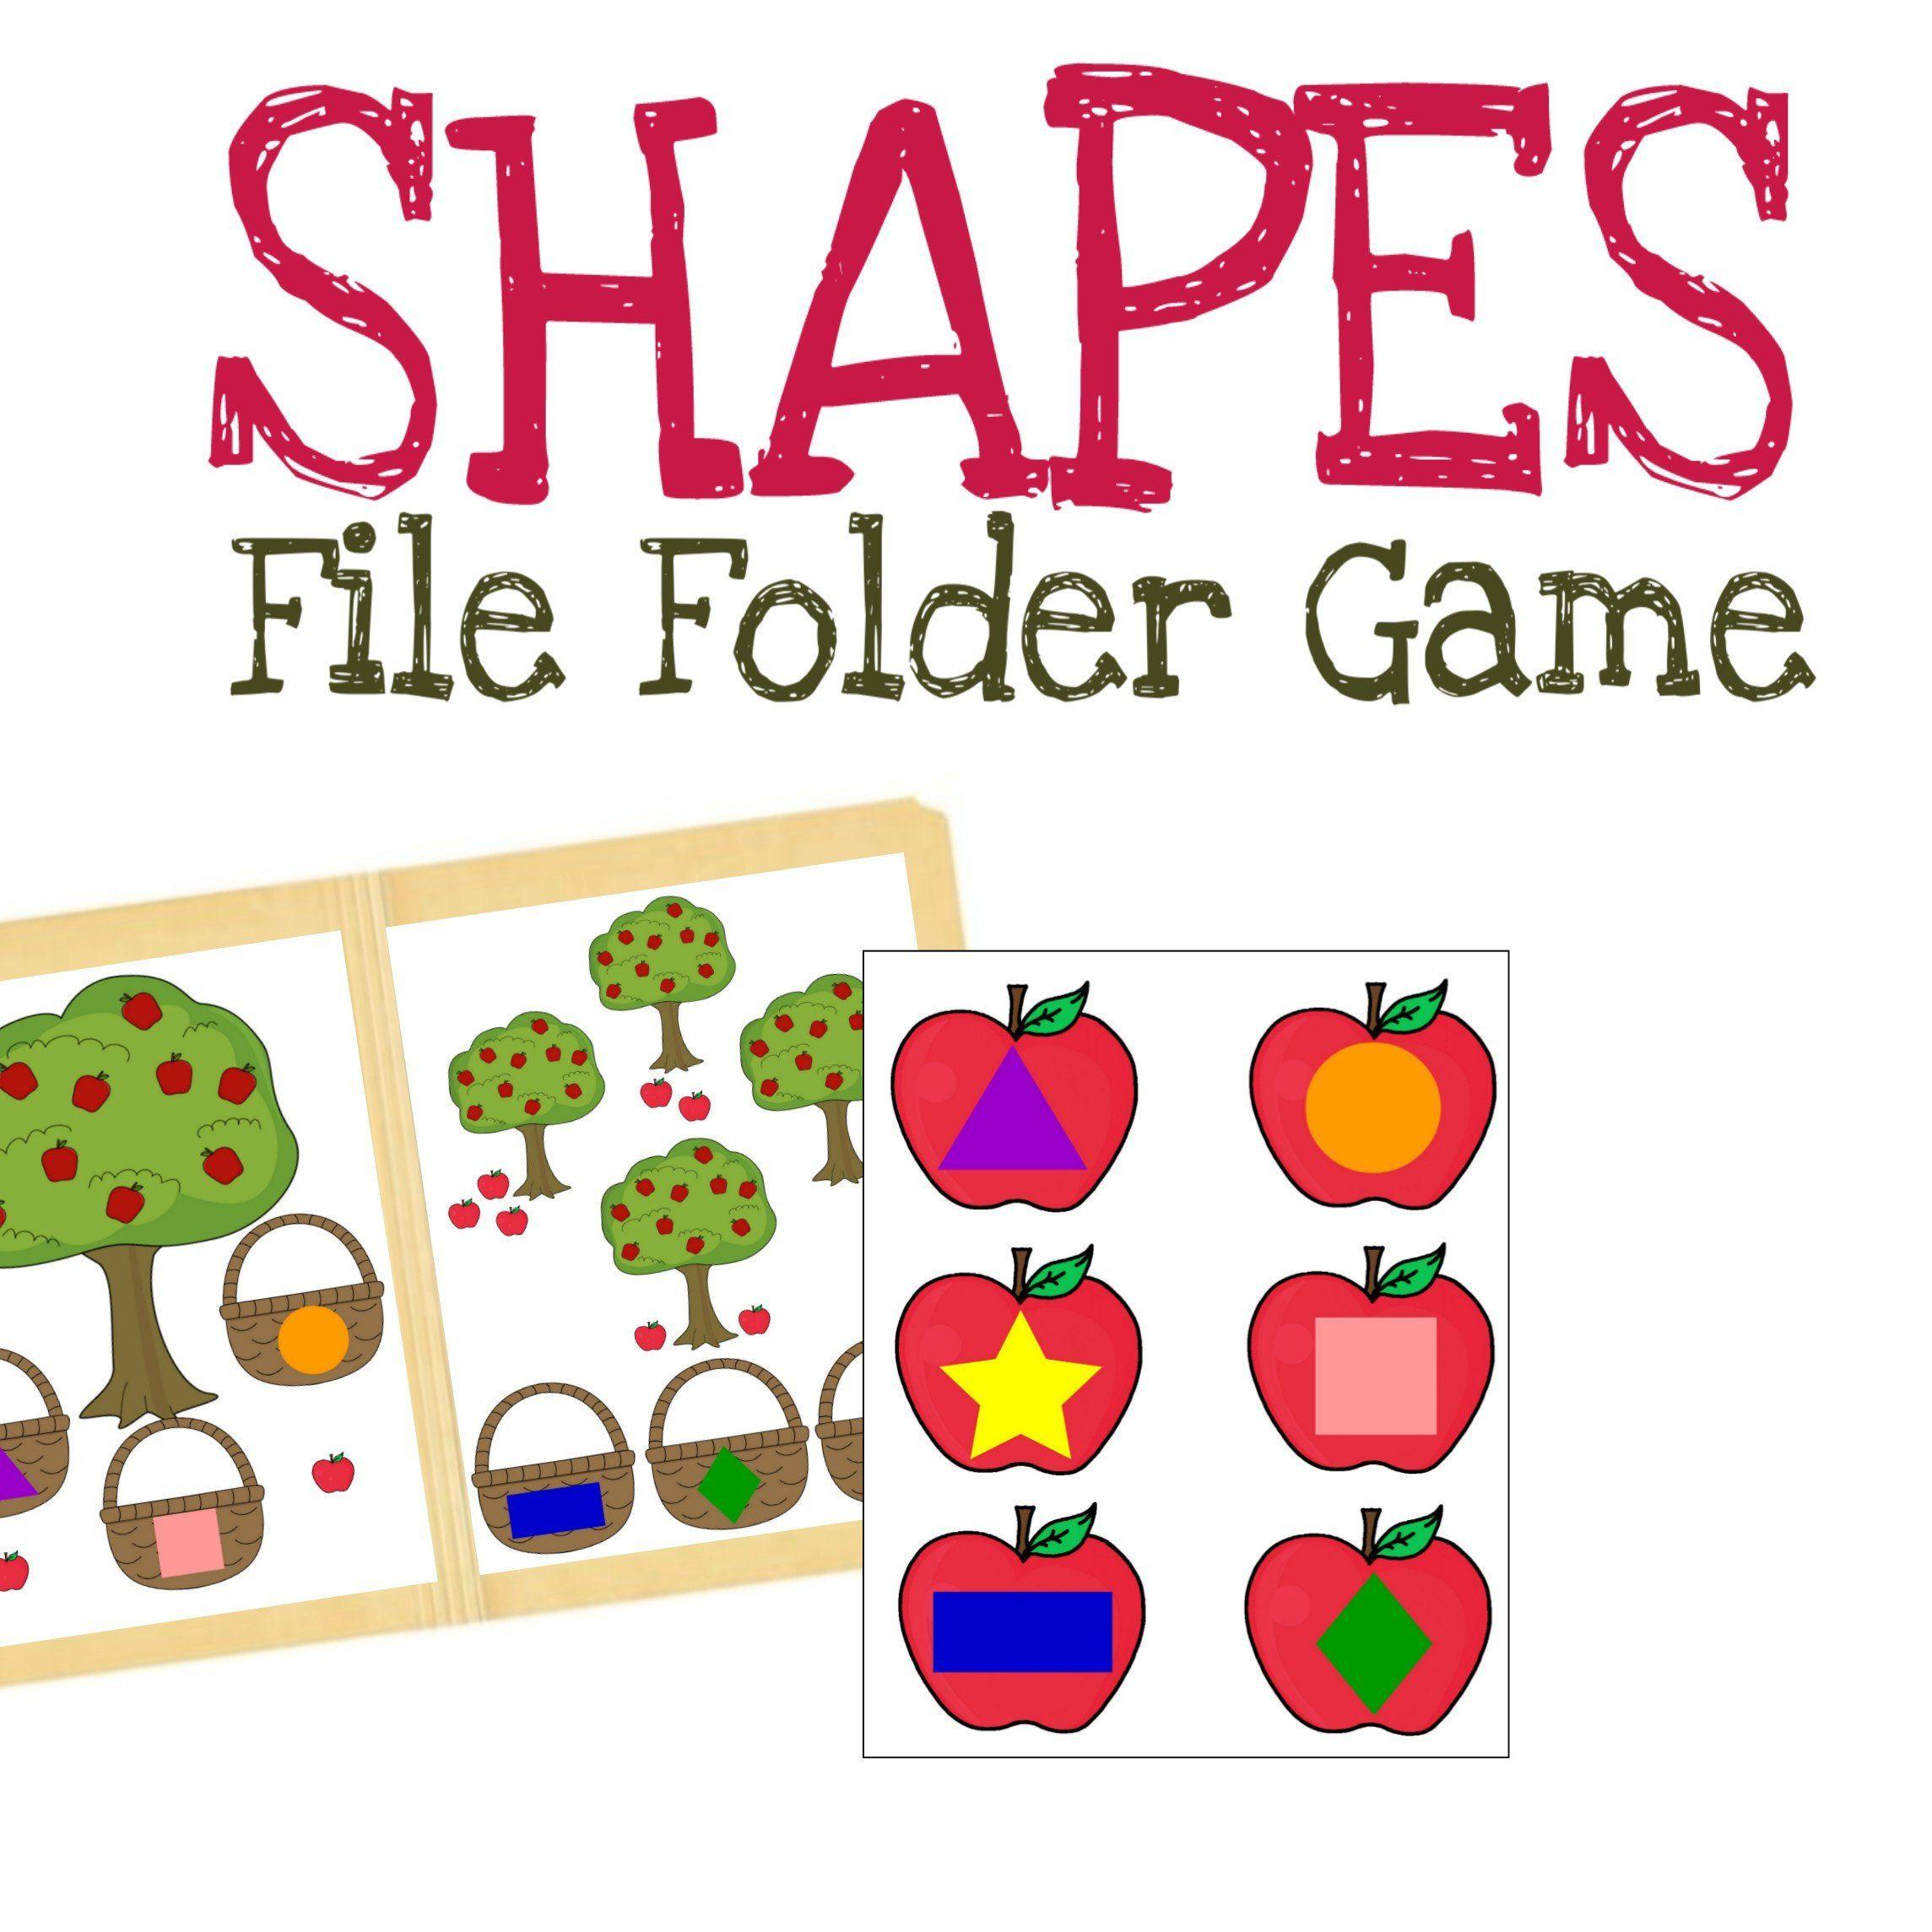 Picking Apples File Folder Game Preschool Activity